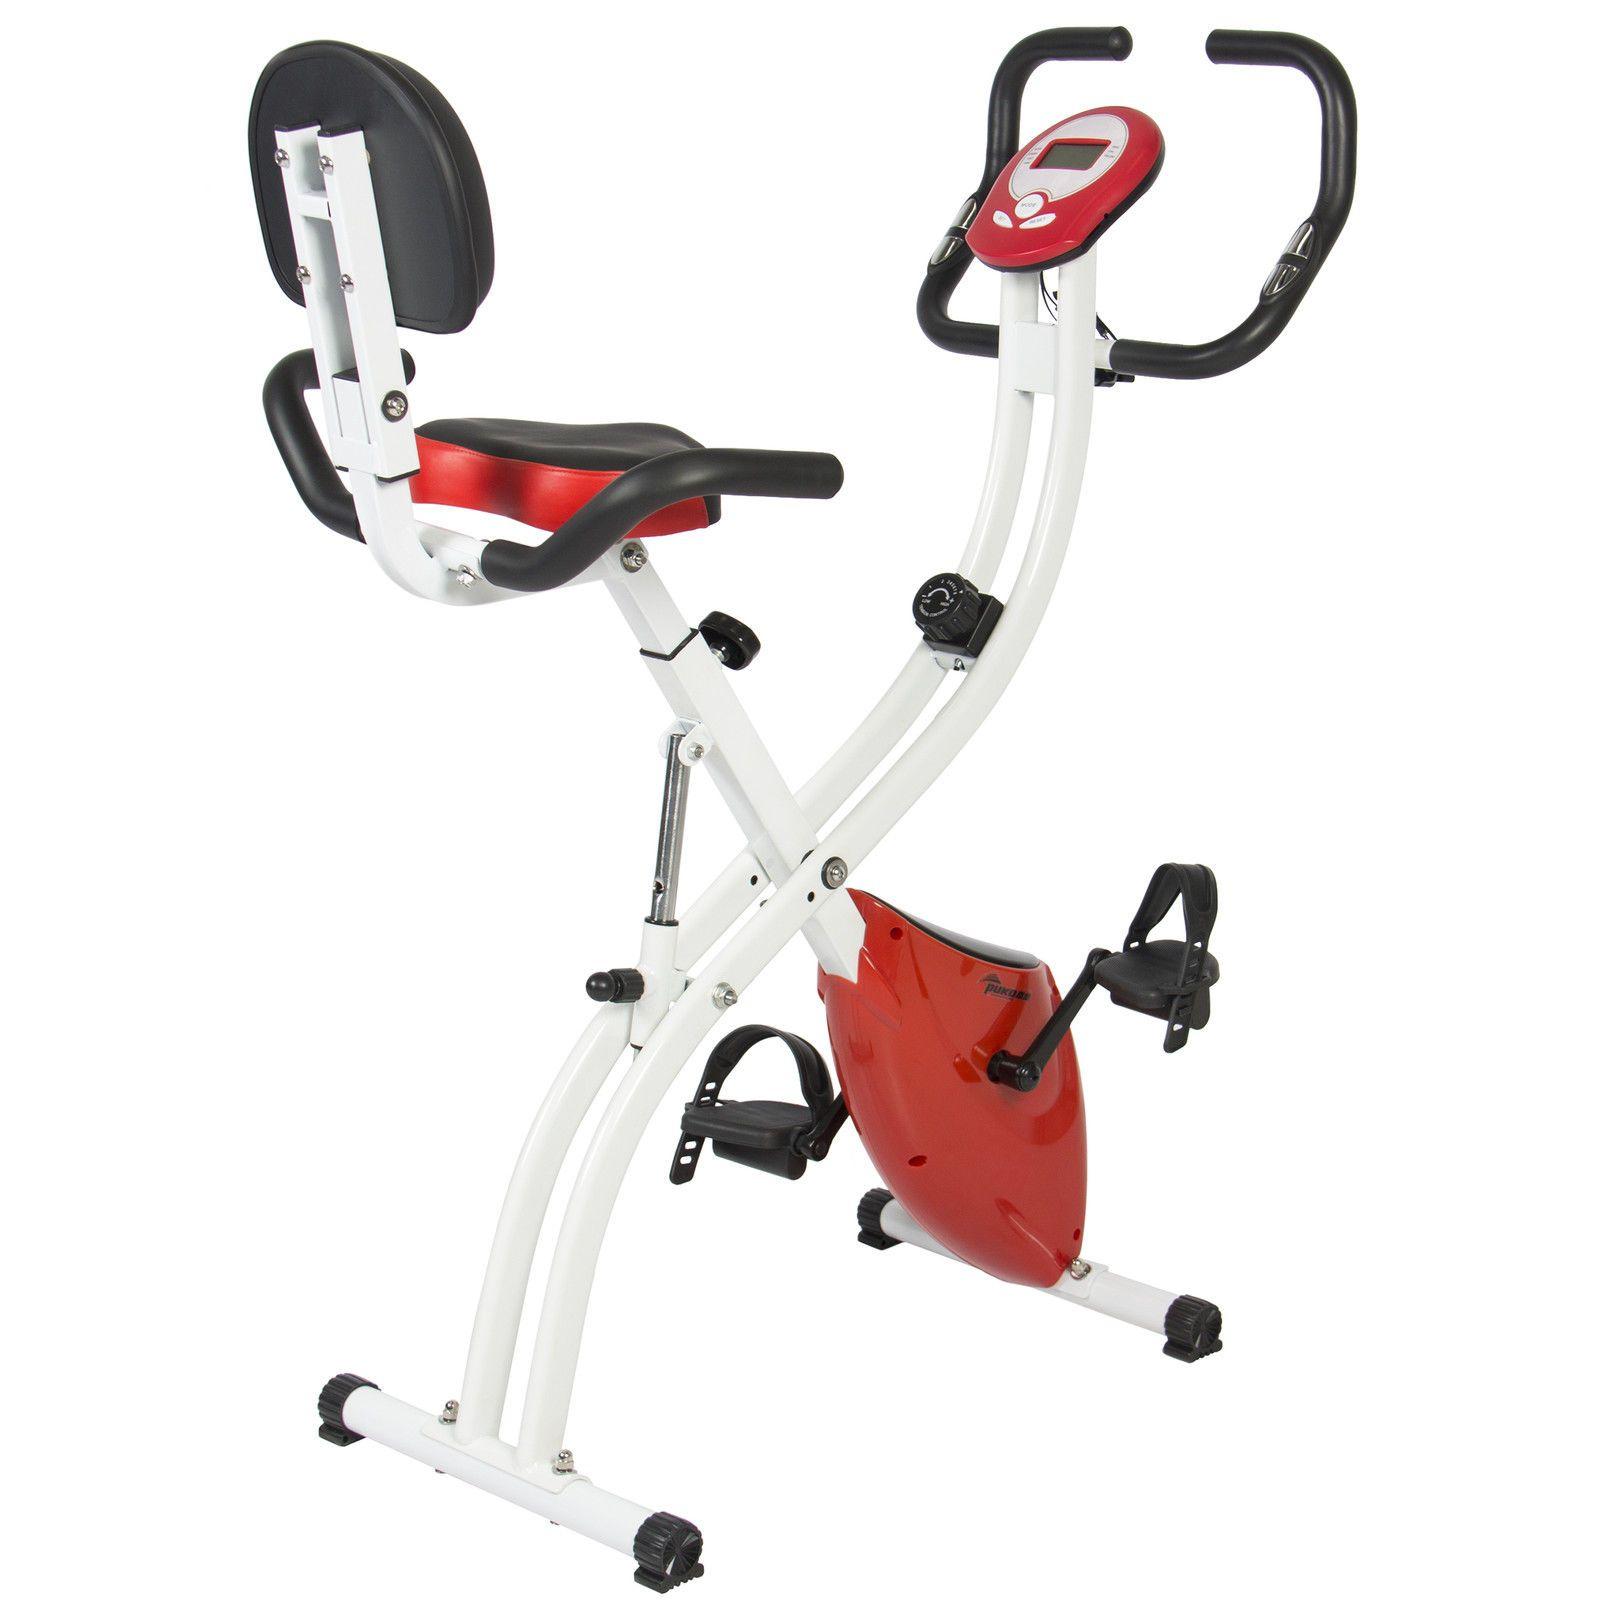 Bcp Folding Adjustable Magnetic Upright Exercise Bike Fitness